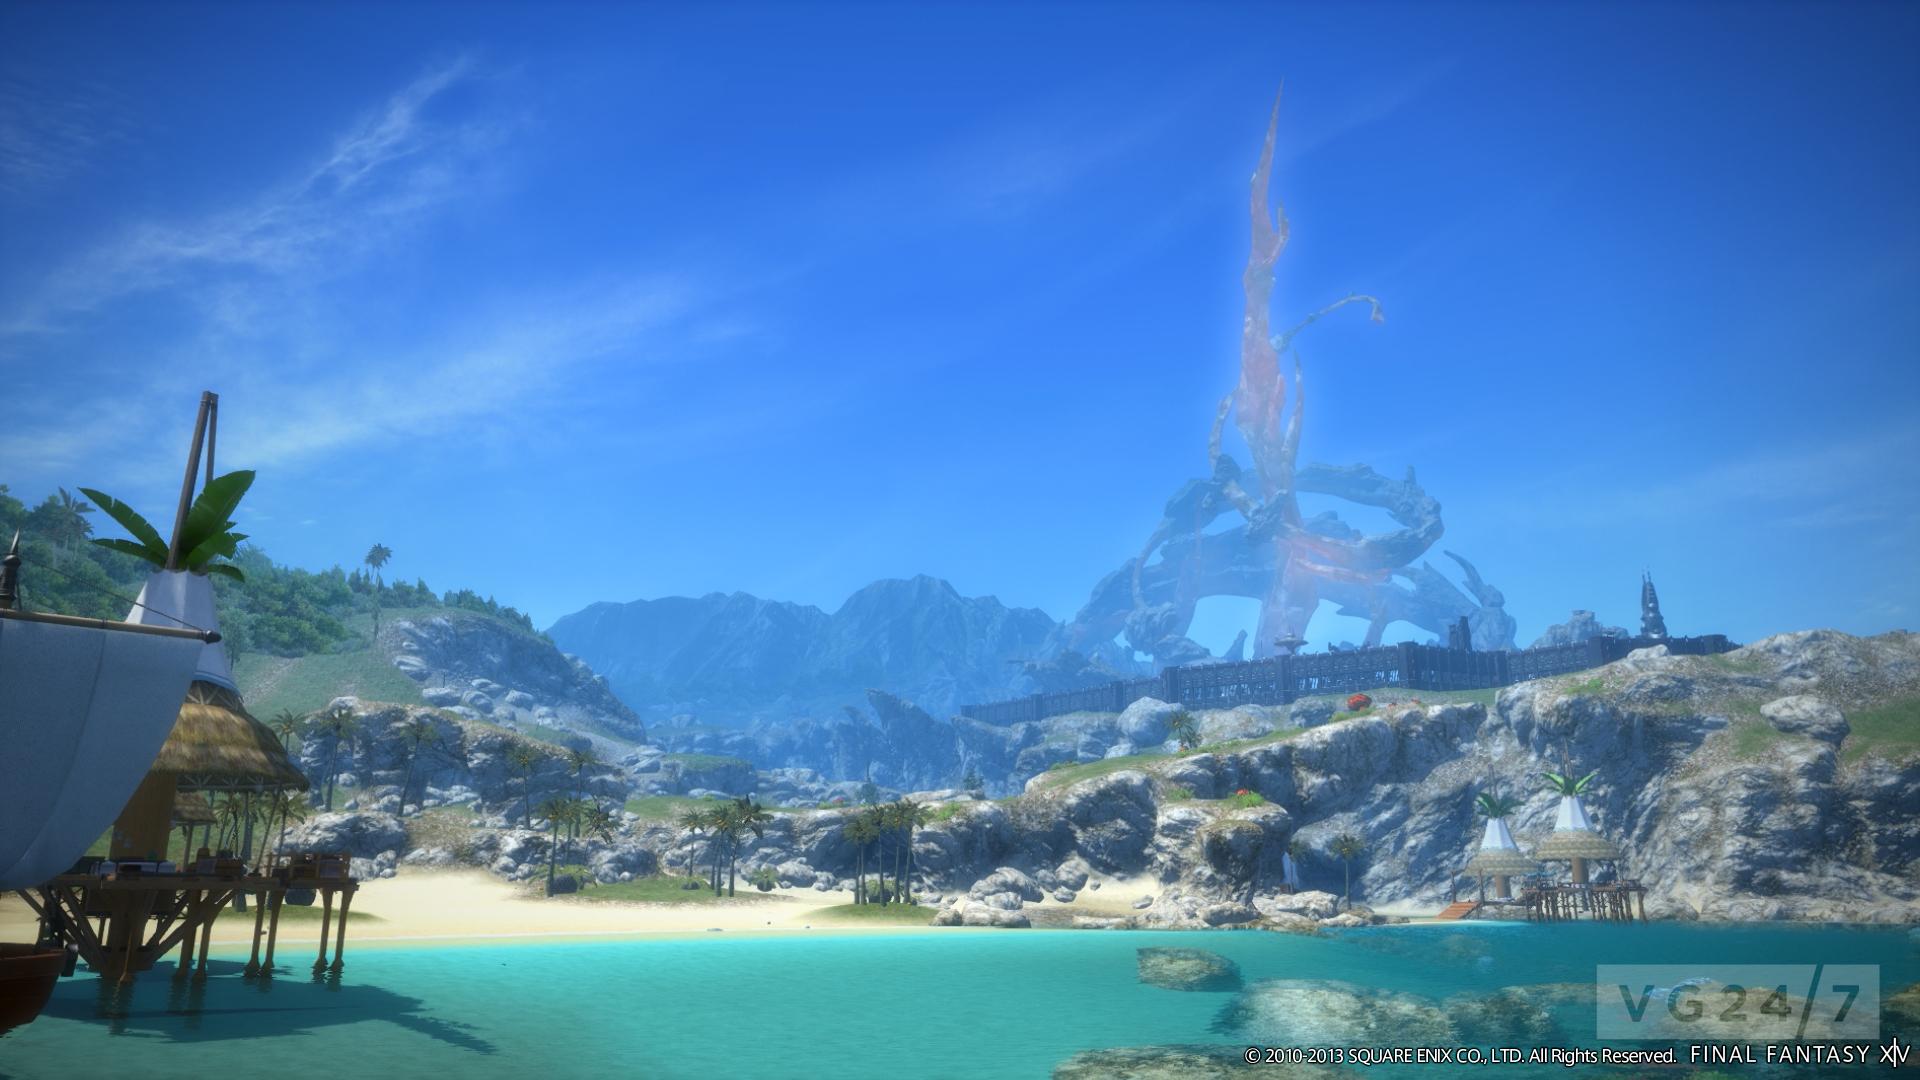 Final Fantasy 14 Yoshidas Crazy MMO Reboot VG247